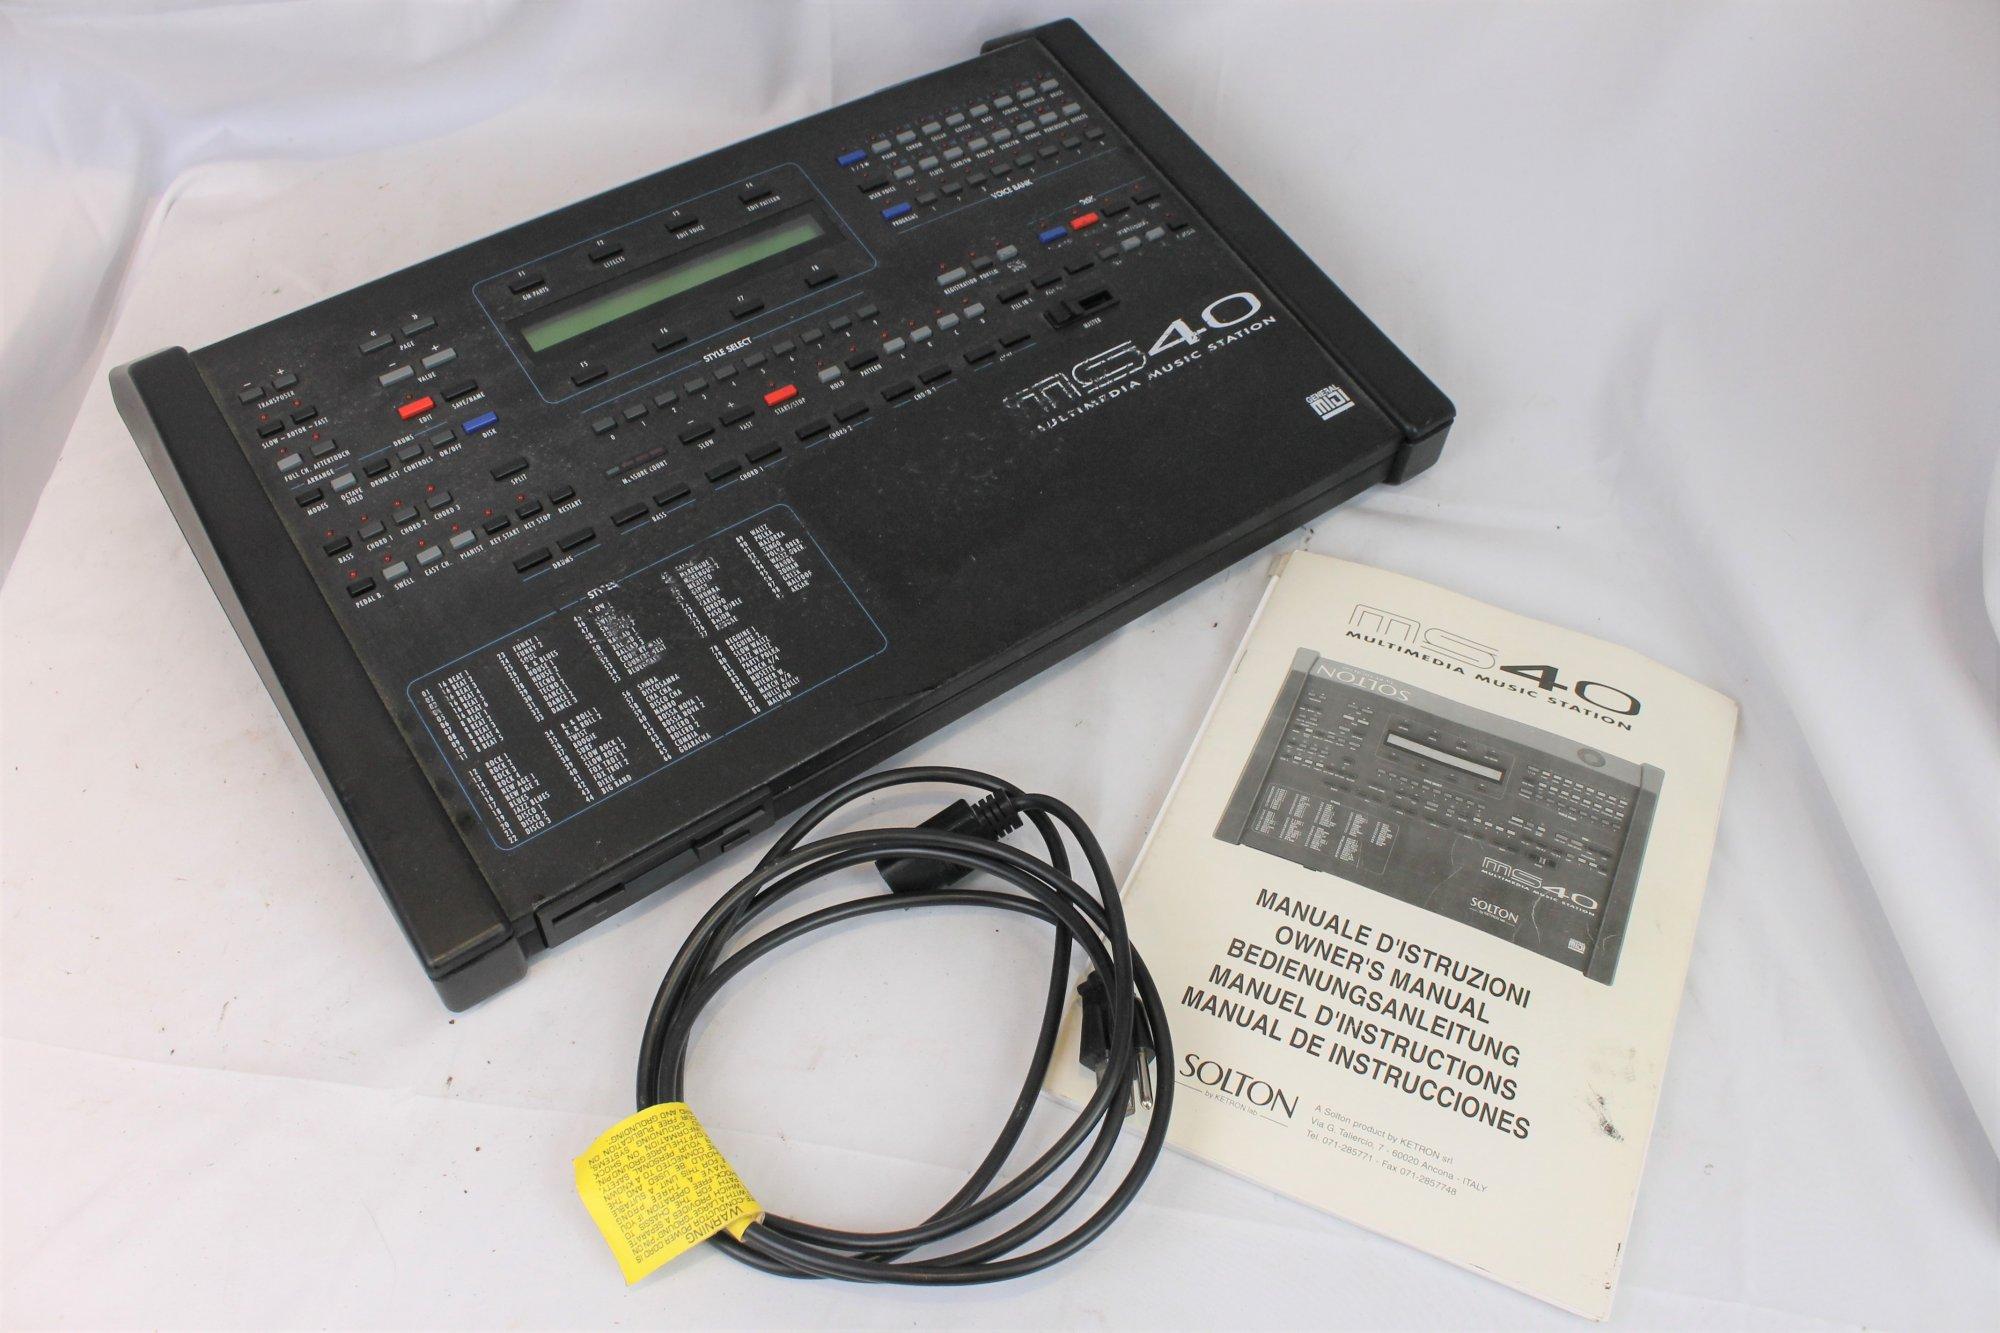 3791 - Ketron Solton MS-40 Multimedia Music Station Midi Module Arranger